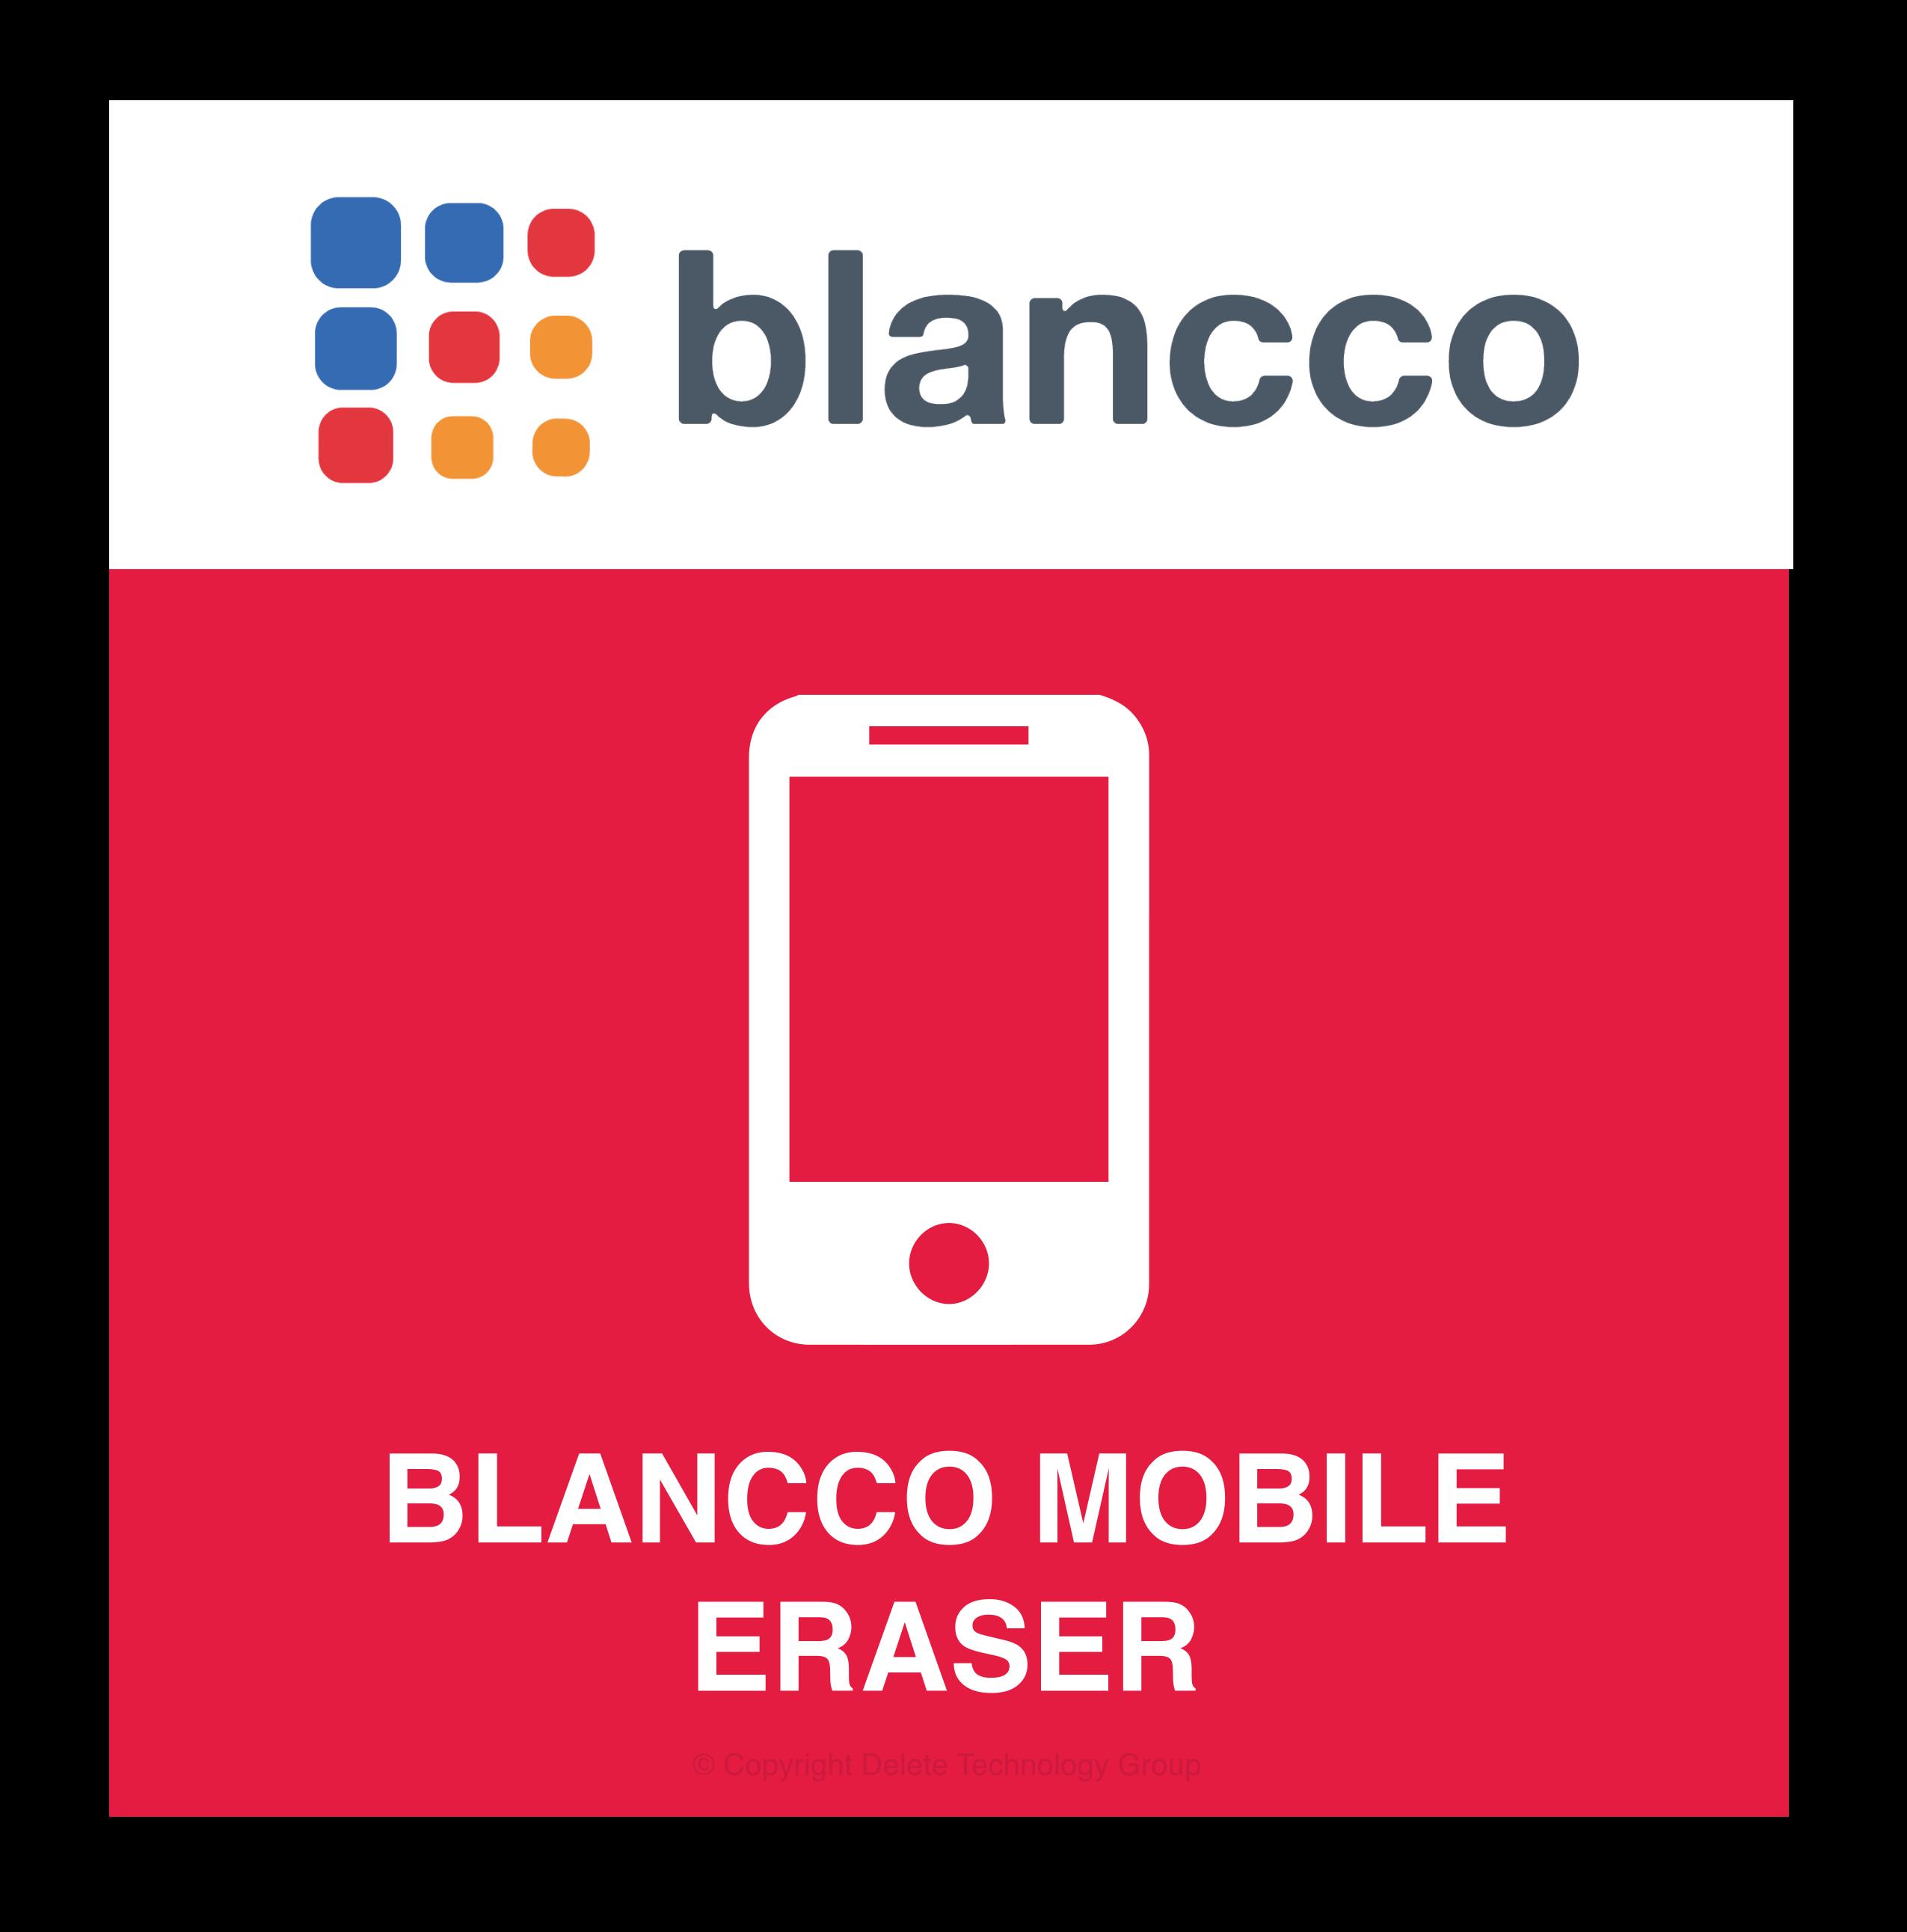 mobile eraser